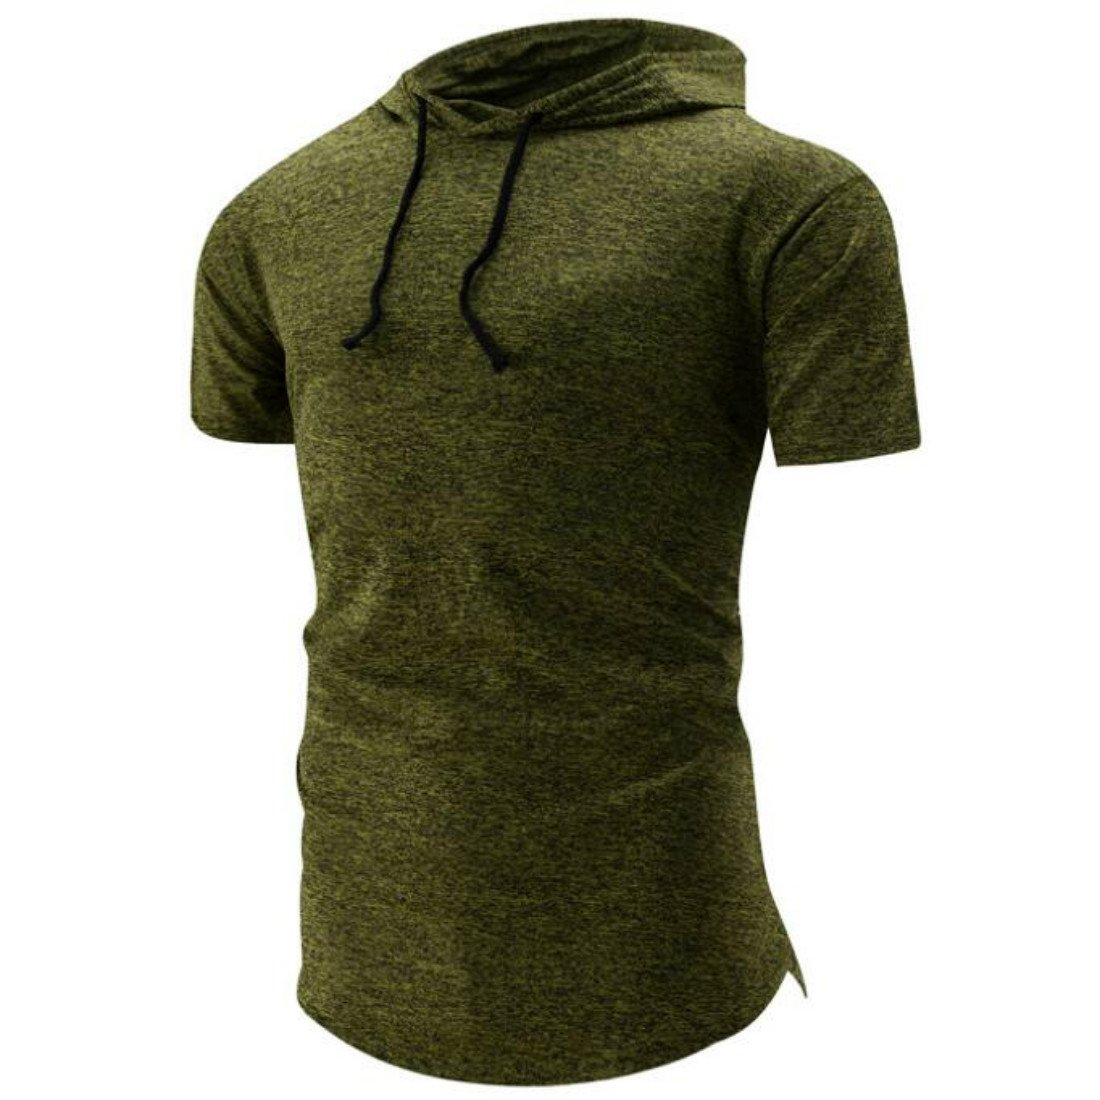 Colygamala Men's Summer Casual Hooded Shirt Slim Short Sleeve Sweatshirts DM2018051404-G-XS